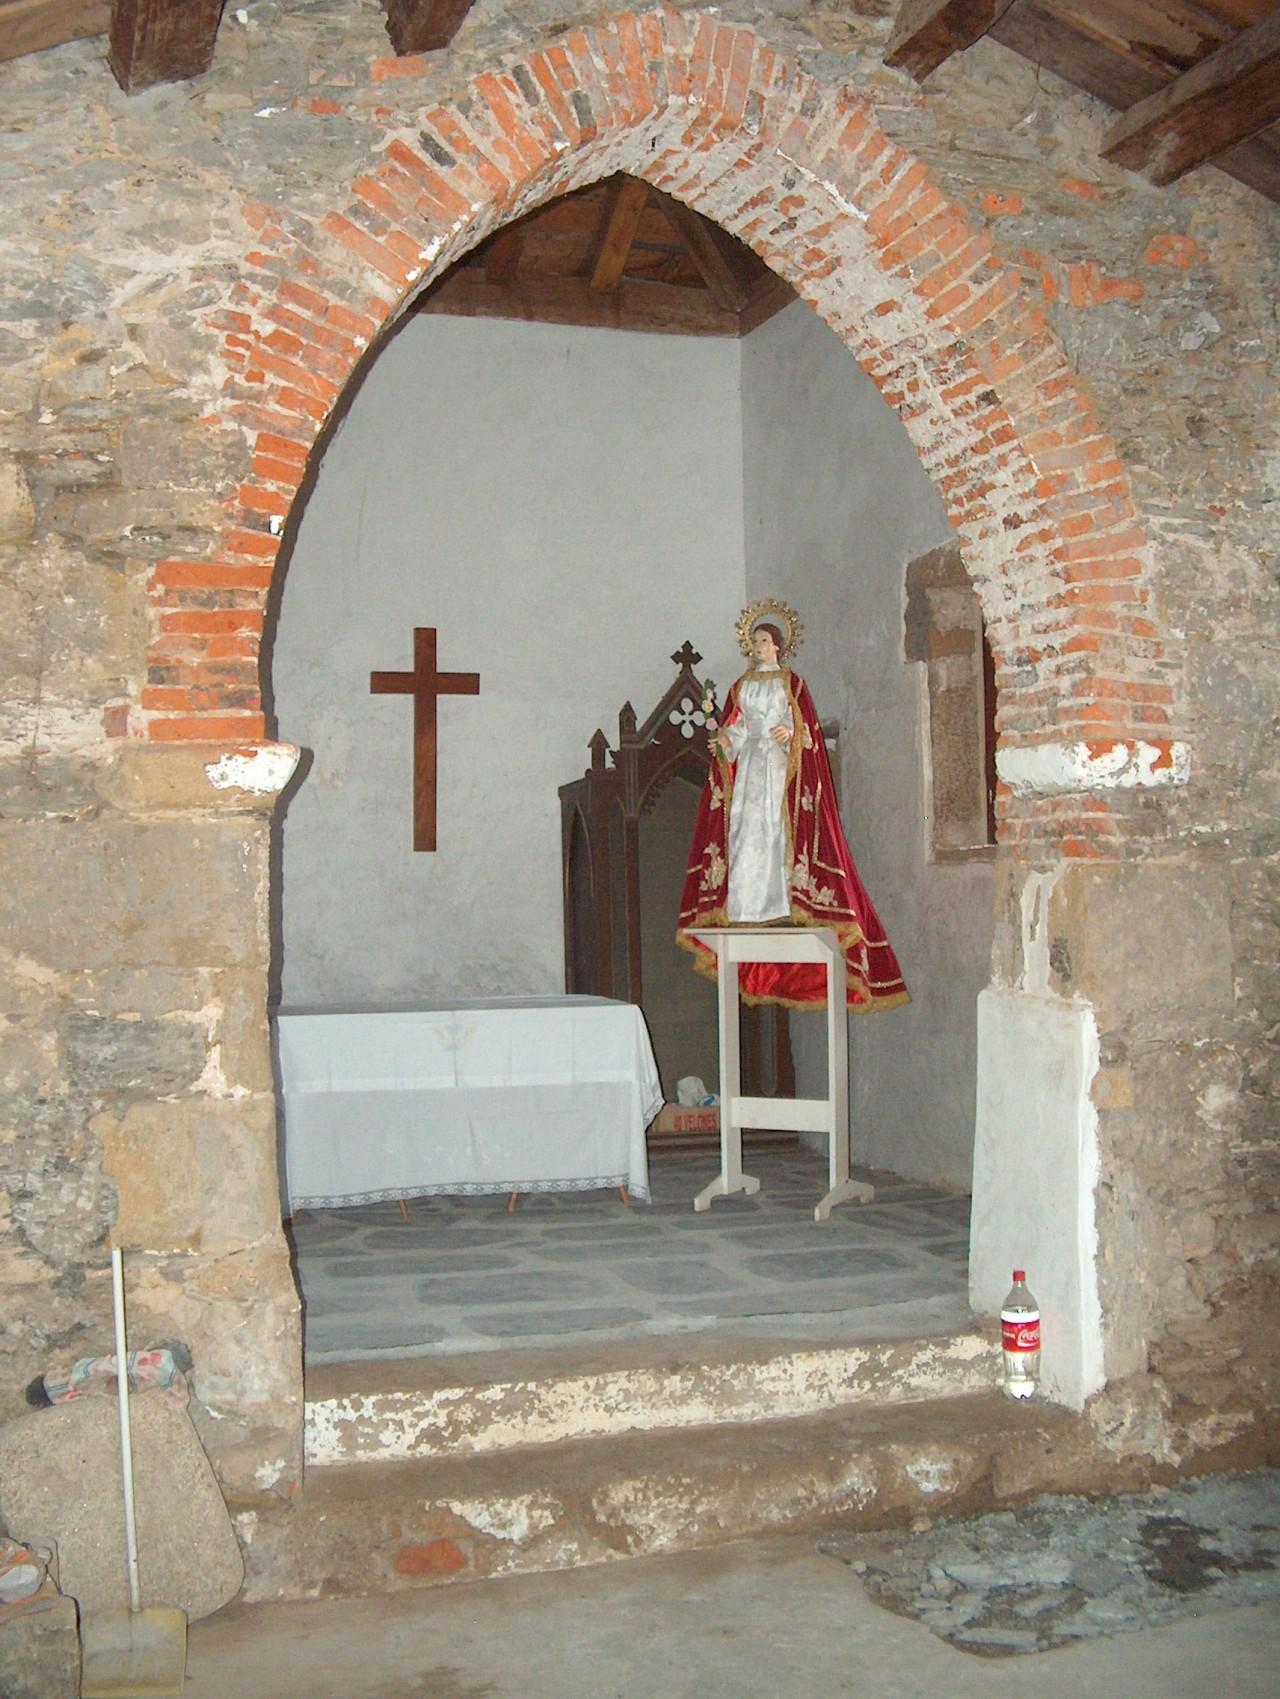 18-arco-apuntado-ermita-santa-comba